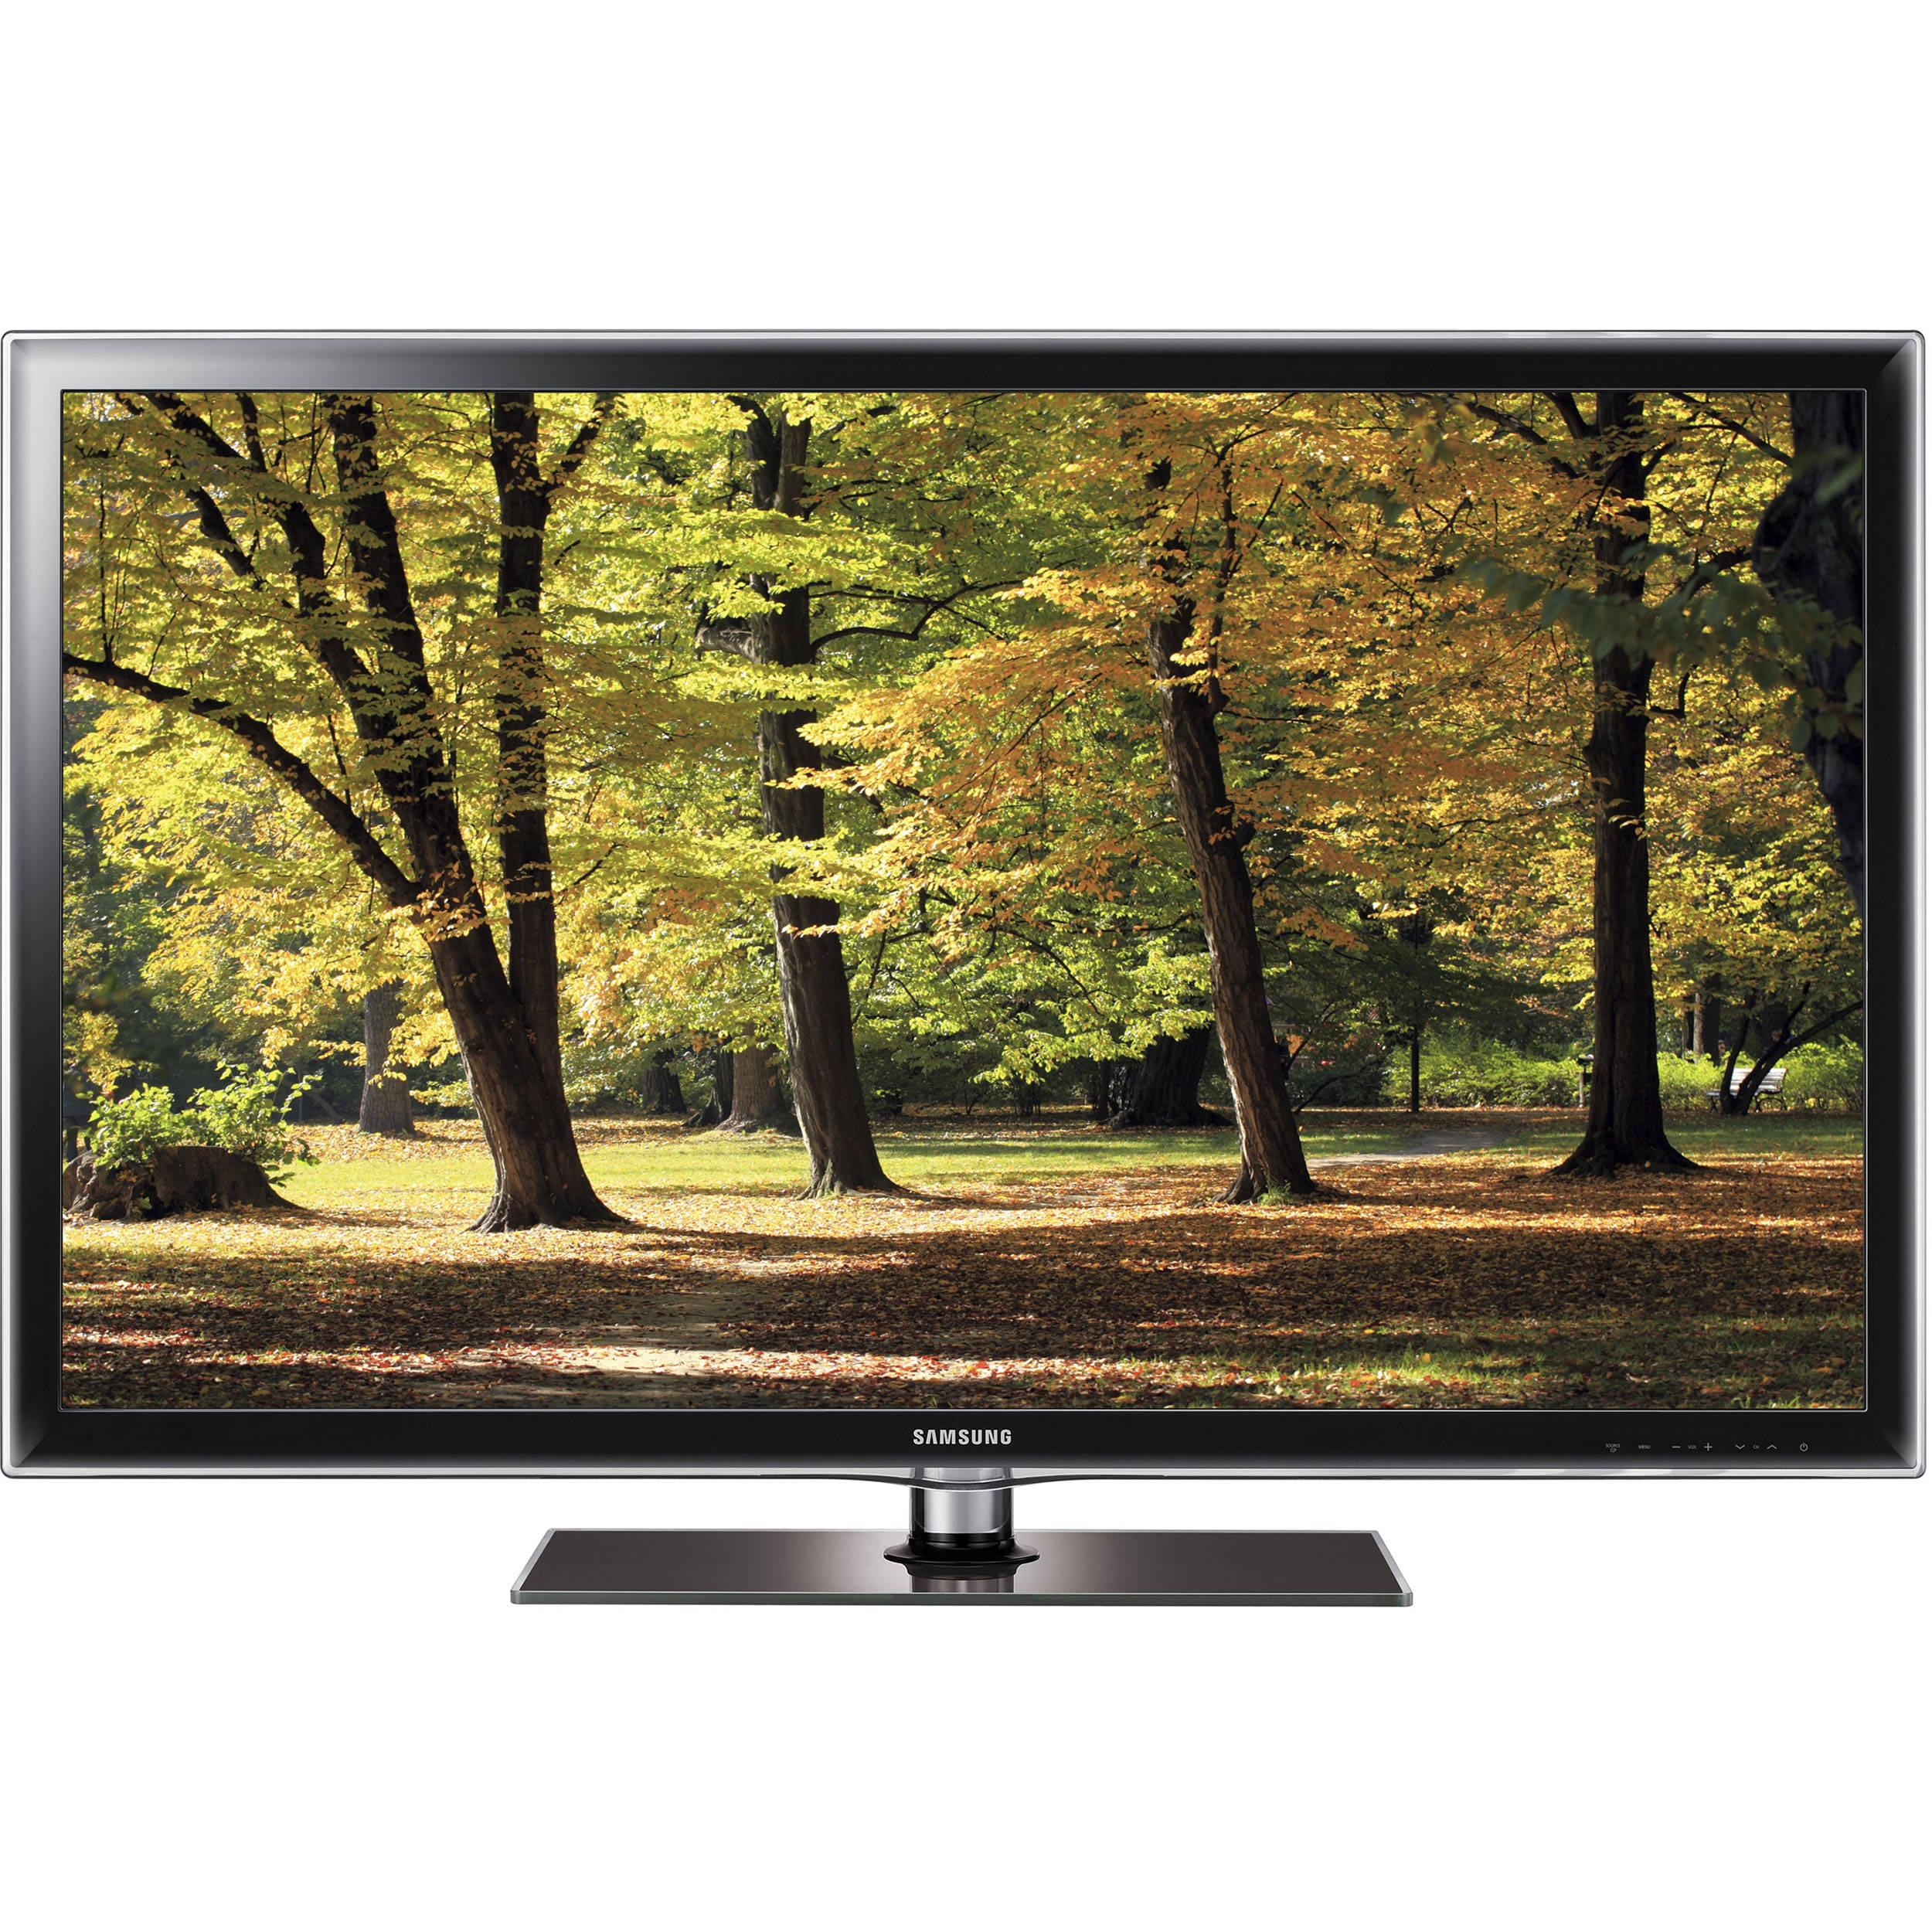 Samsung Un46d6300 46 Led Hdtv Un46d6300sfxza Bh Photo Circuit Board For Lcd Tv